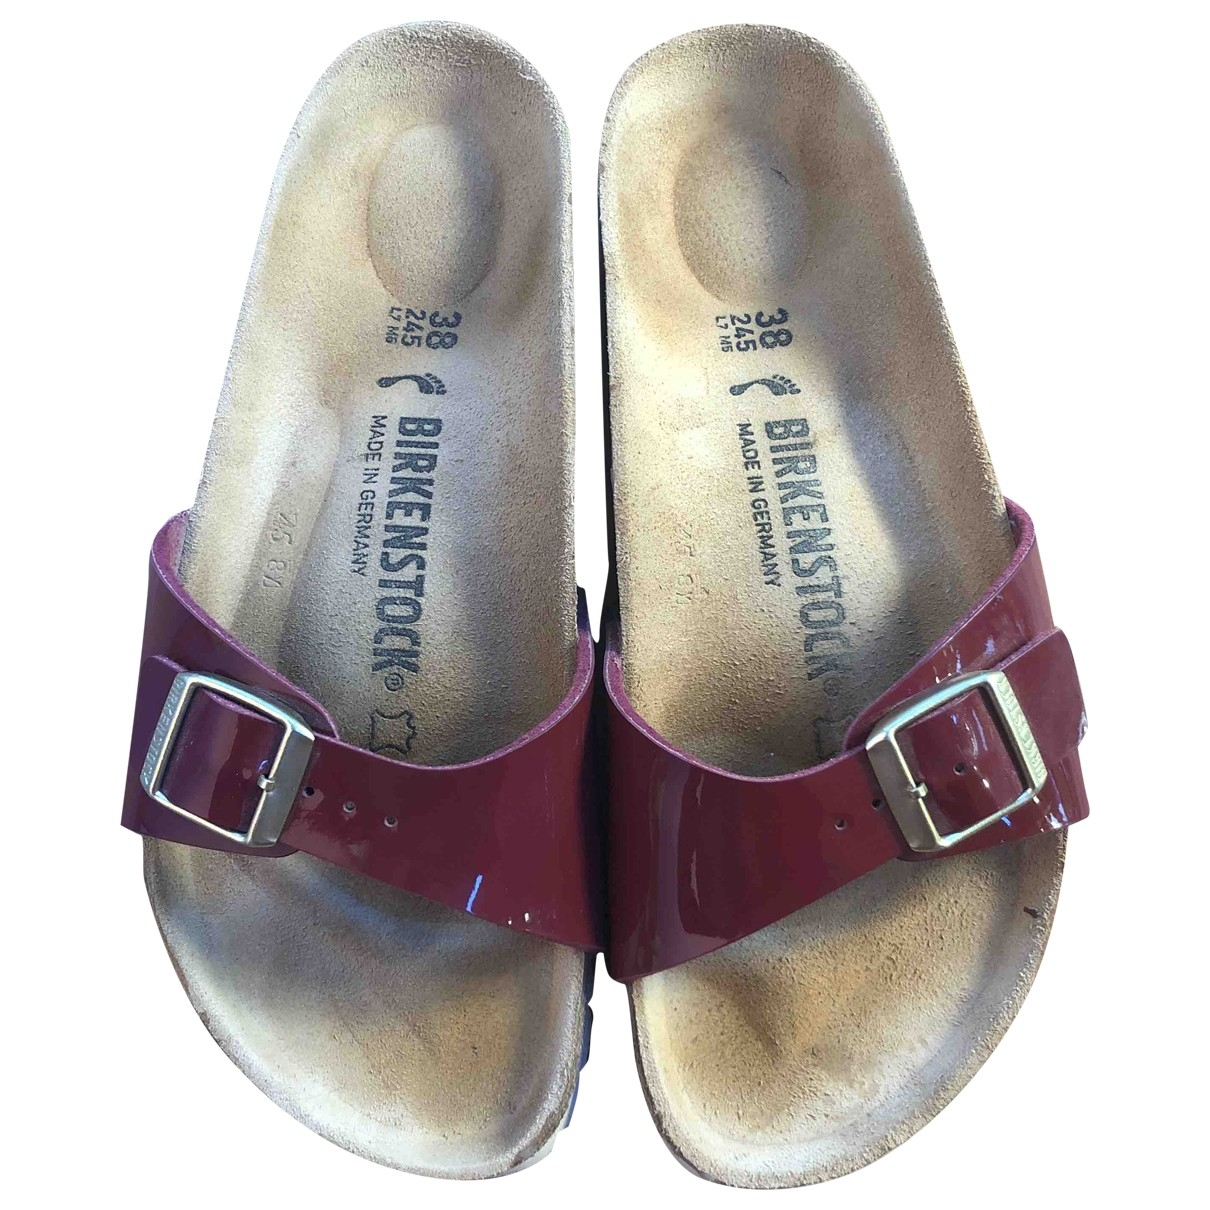 Birkenstock \N Burgundy Patent leather Mules & Clogs for Women 38 EU